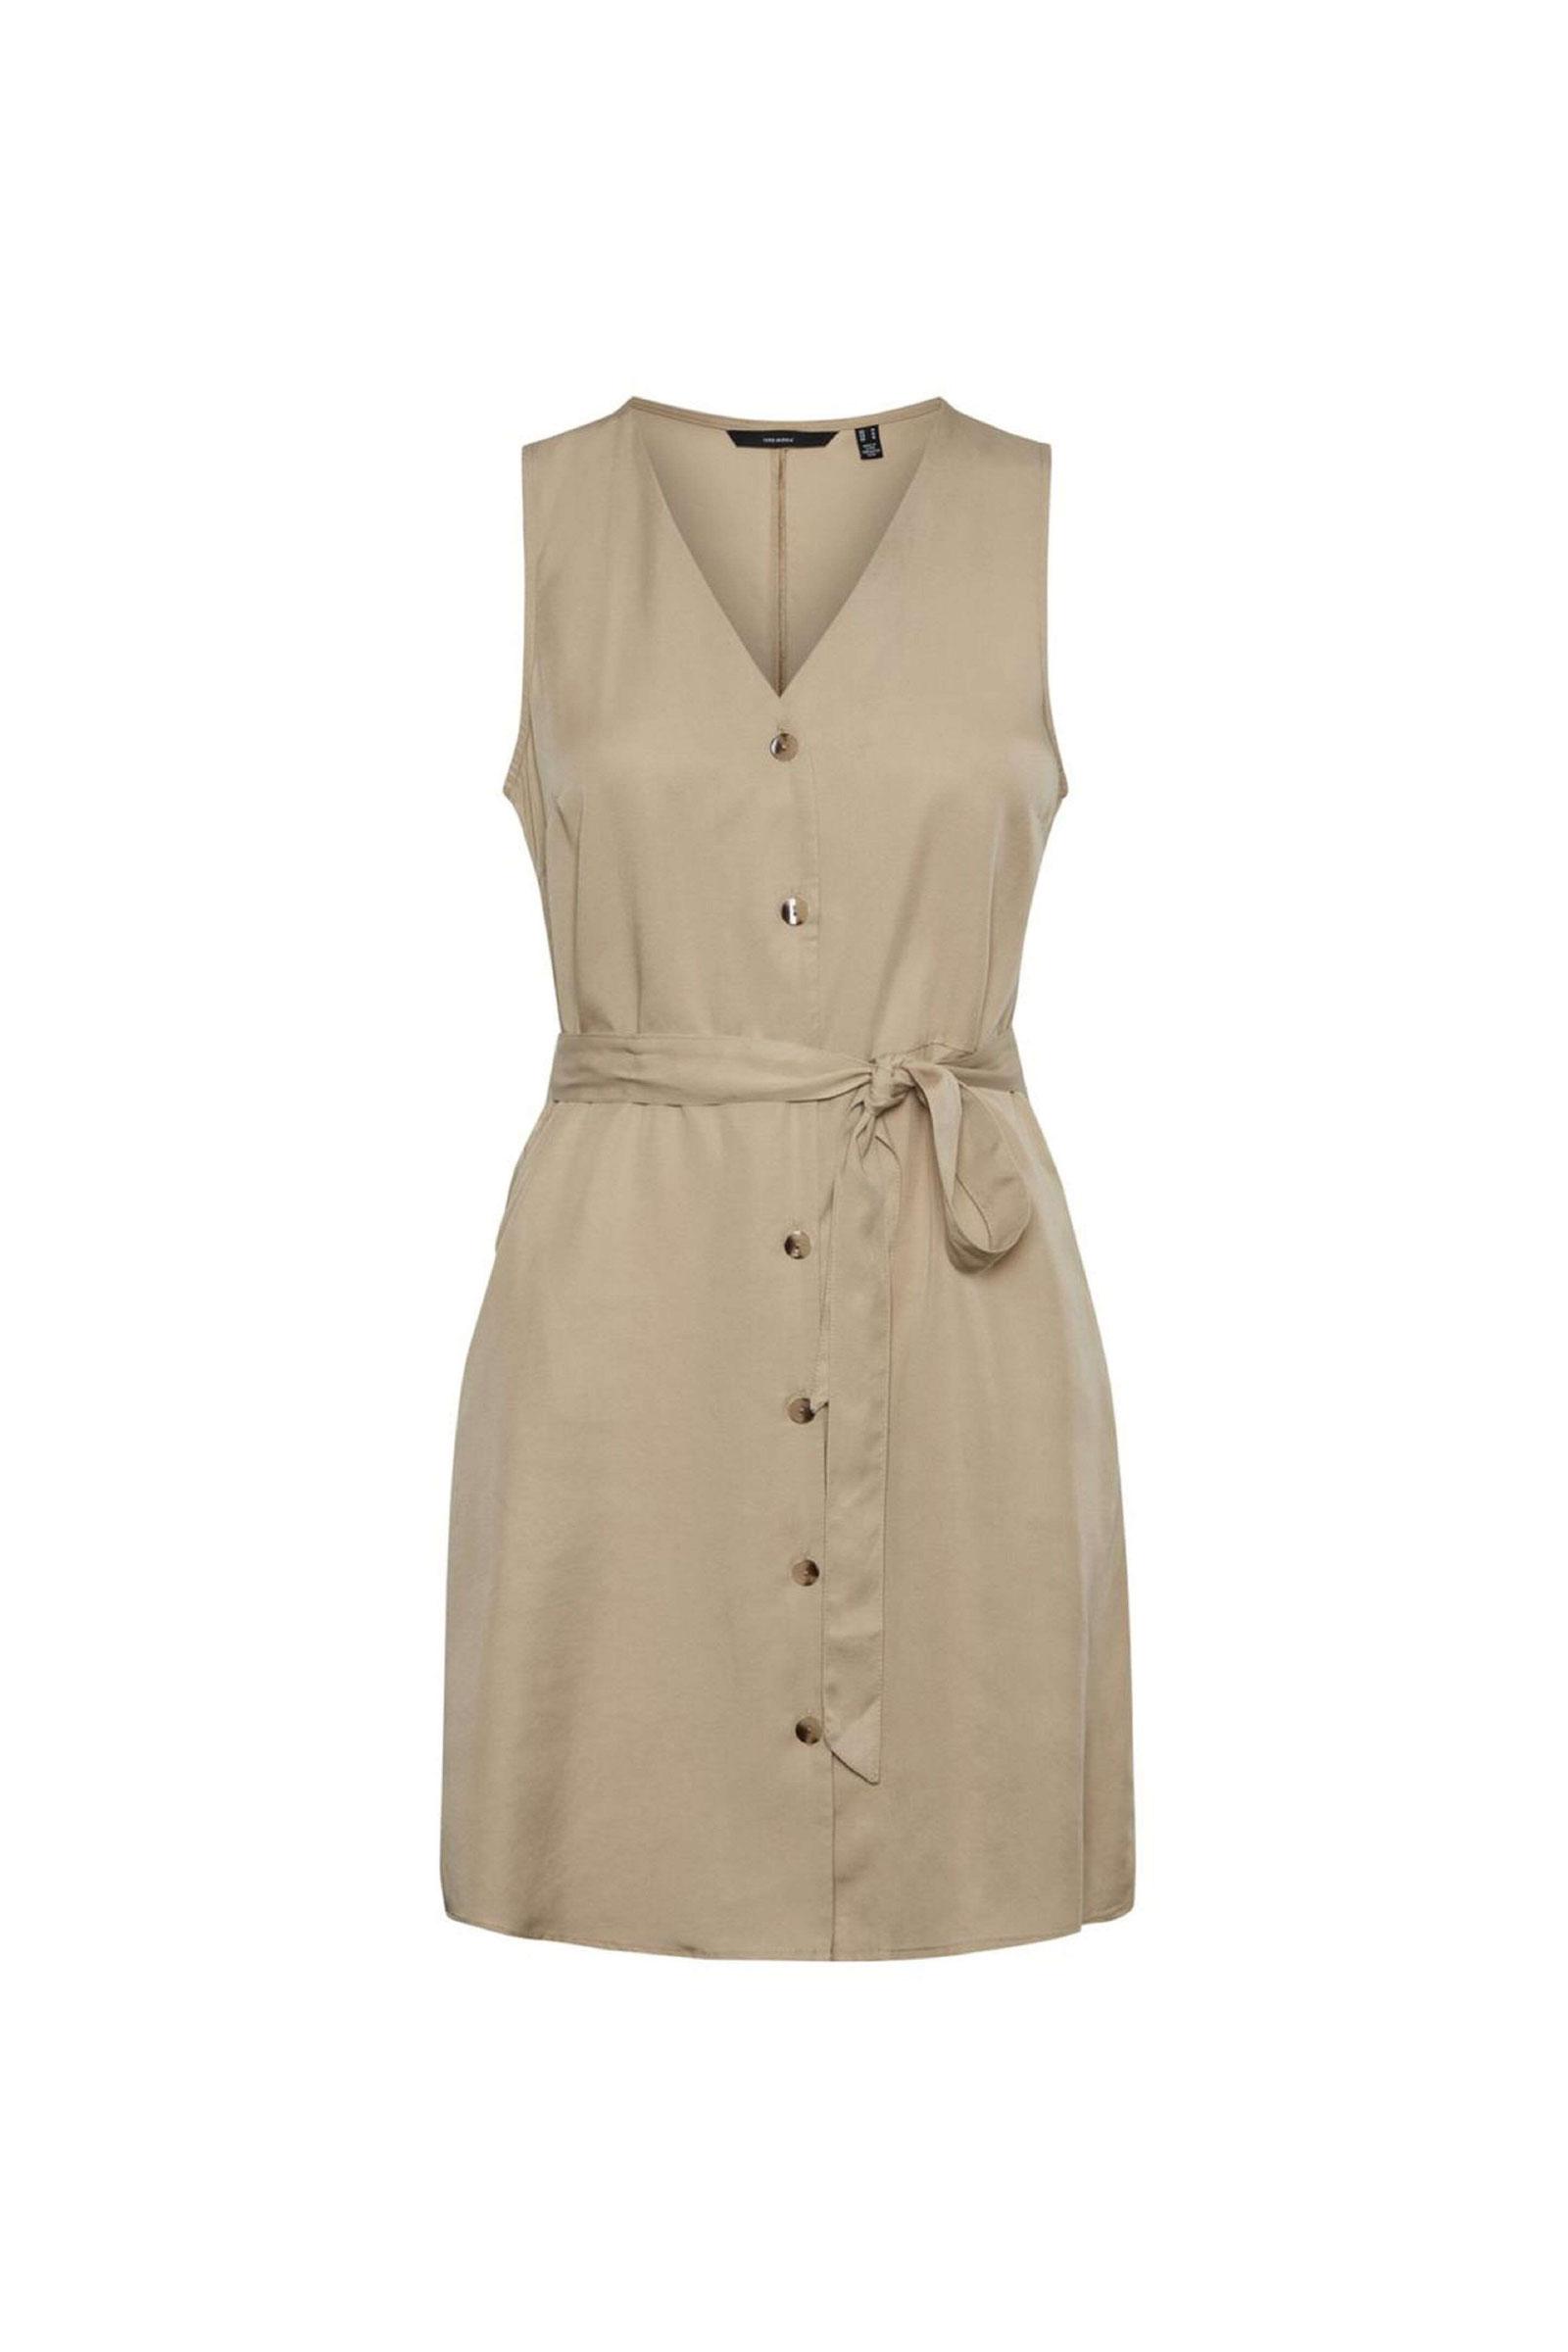 VERO MODA Woman Dress VERO MODA   Dress   10242291Nomad